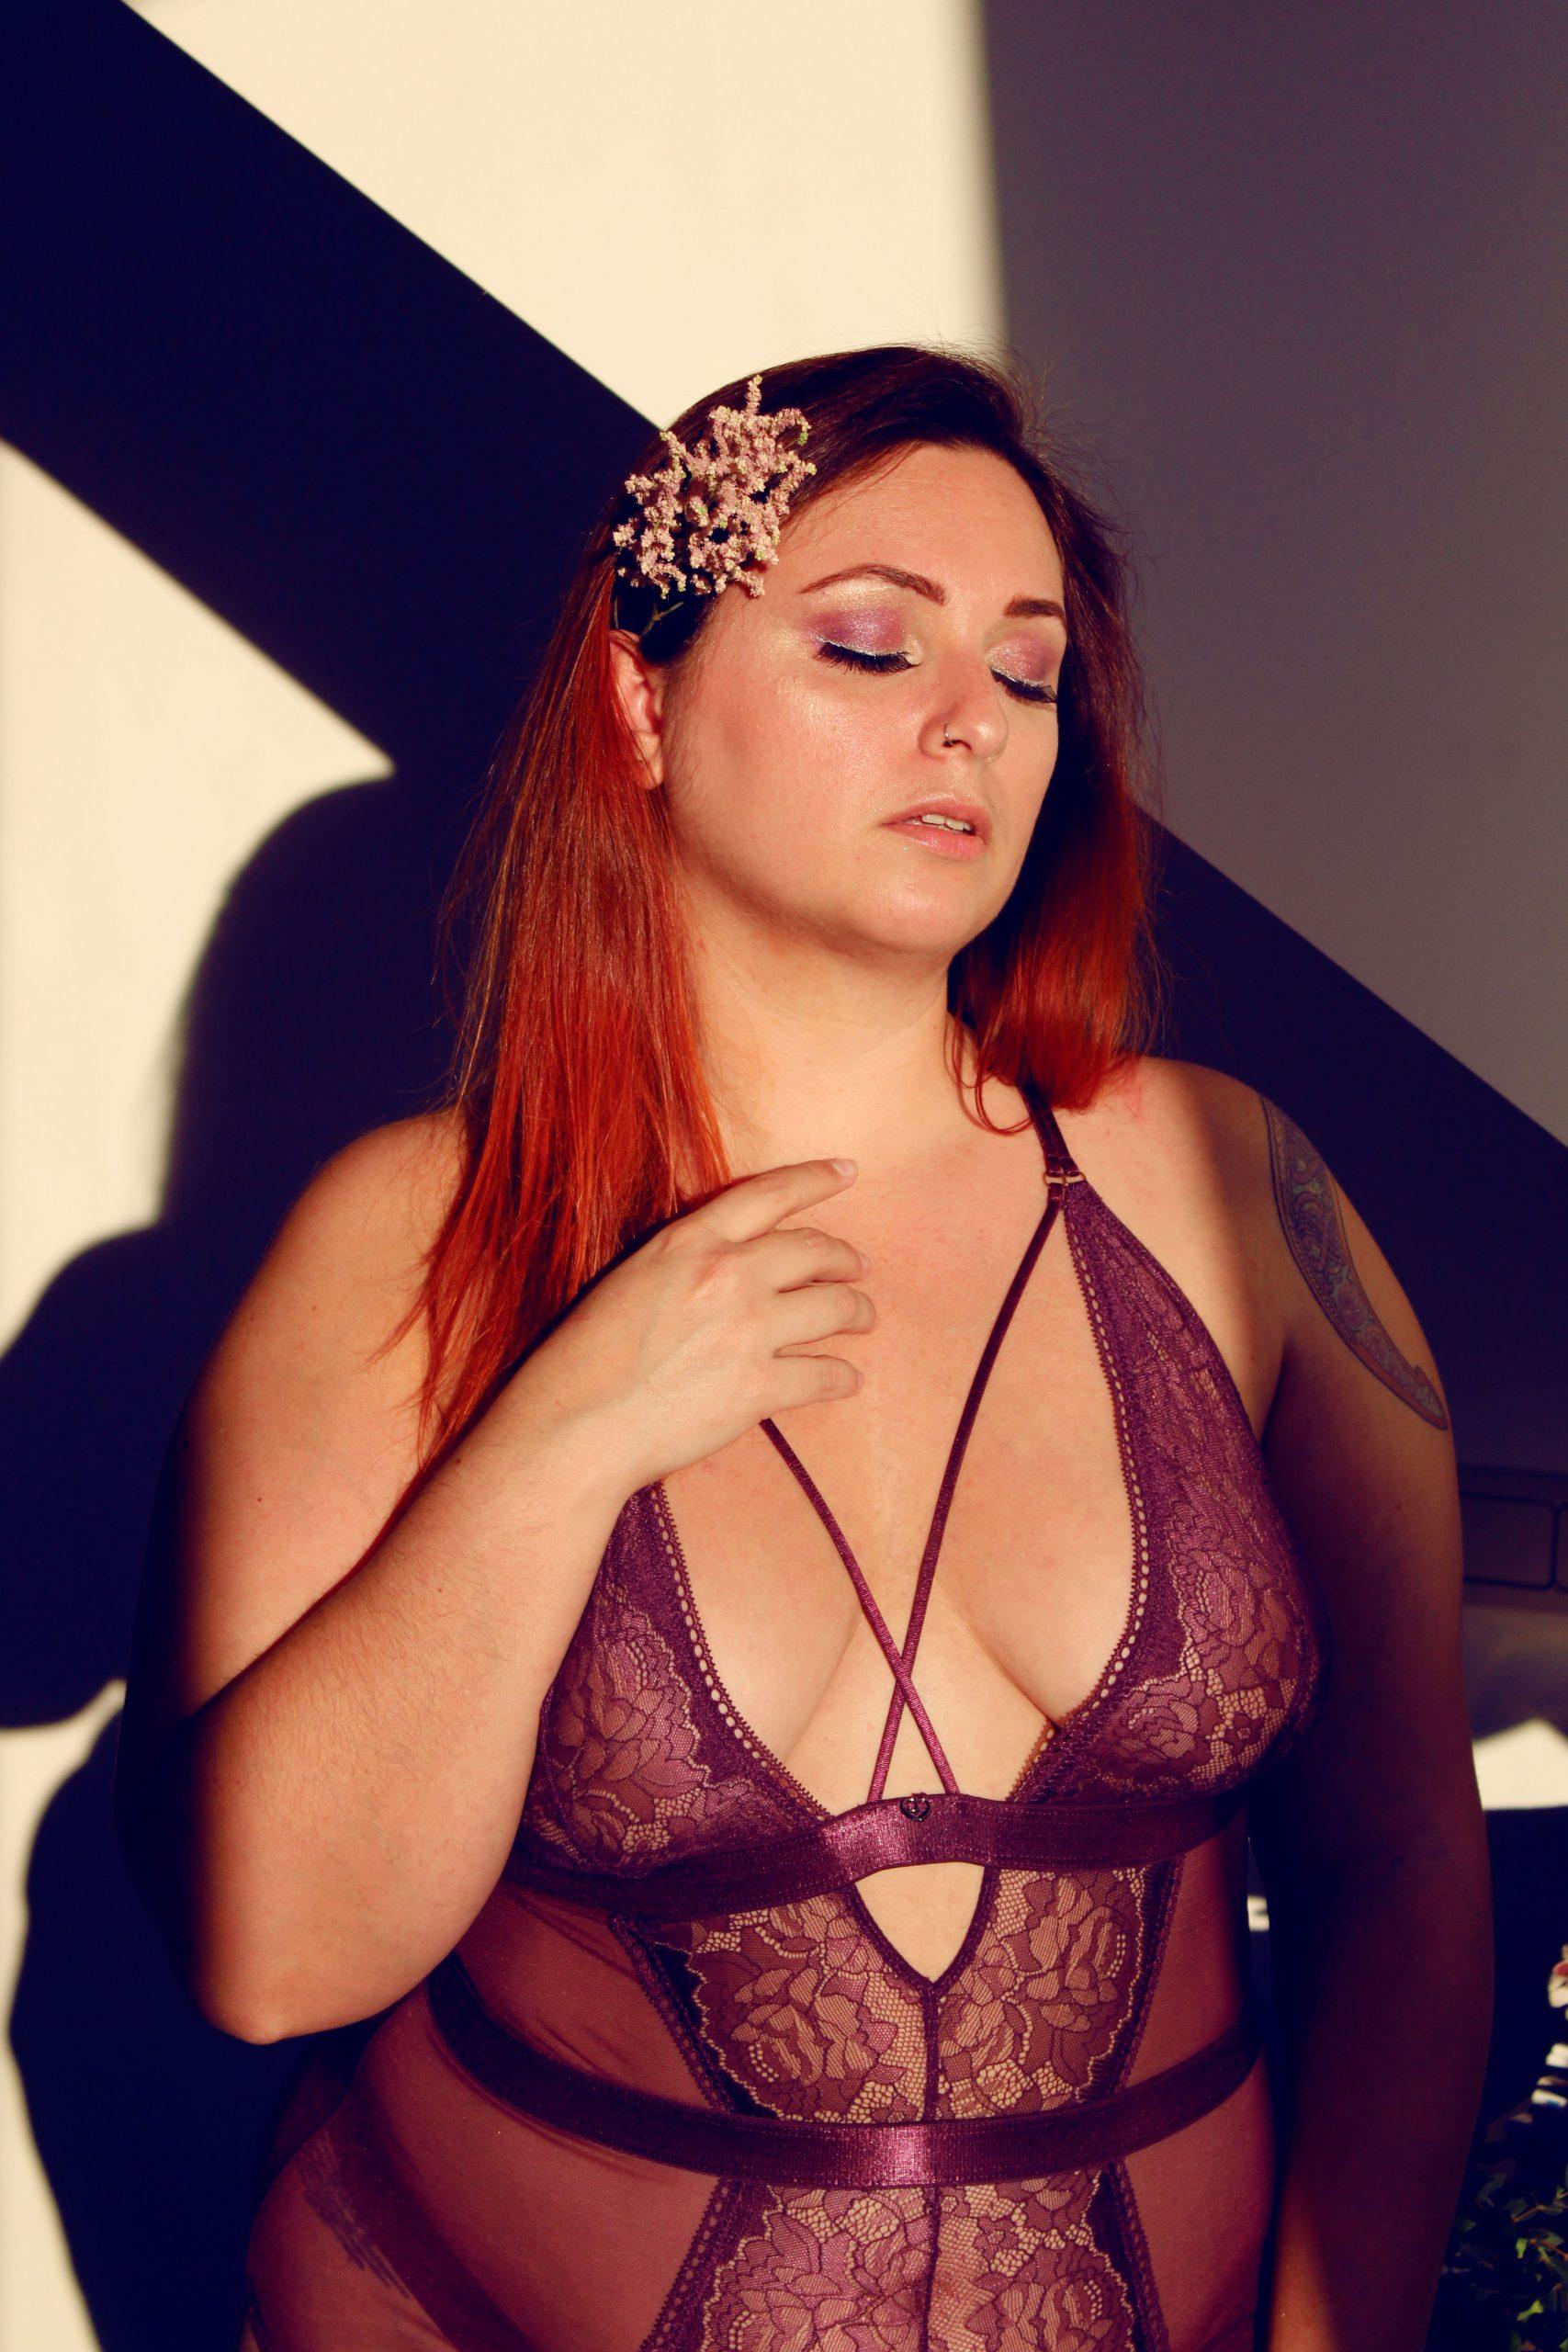 lingerie-sexy-grande-taille-lovehoney-blog-lingerie-conseil-lingerie-face3